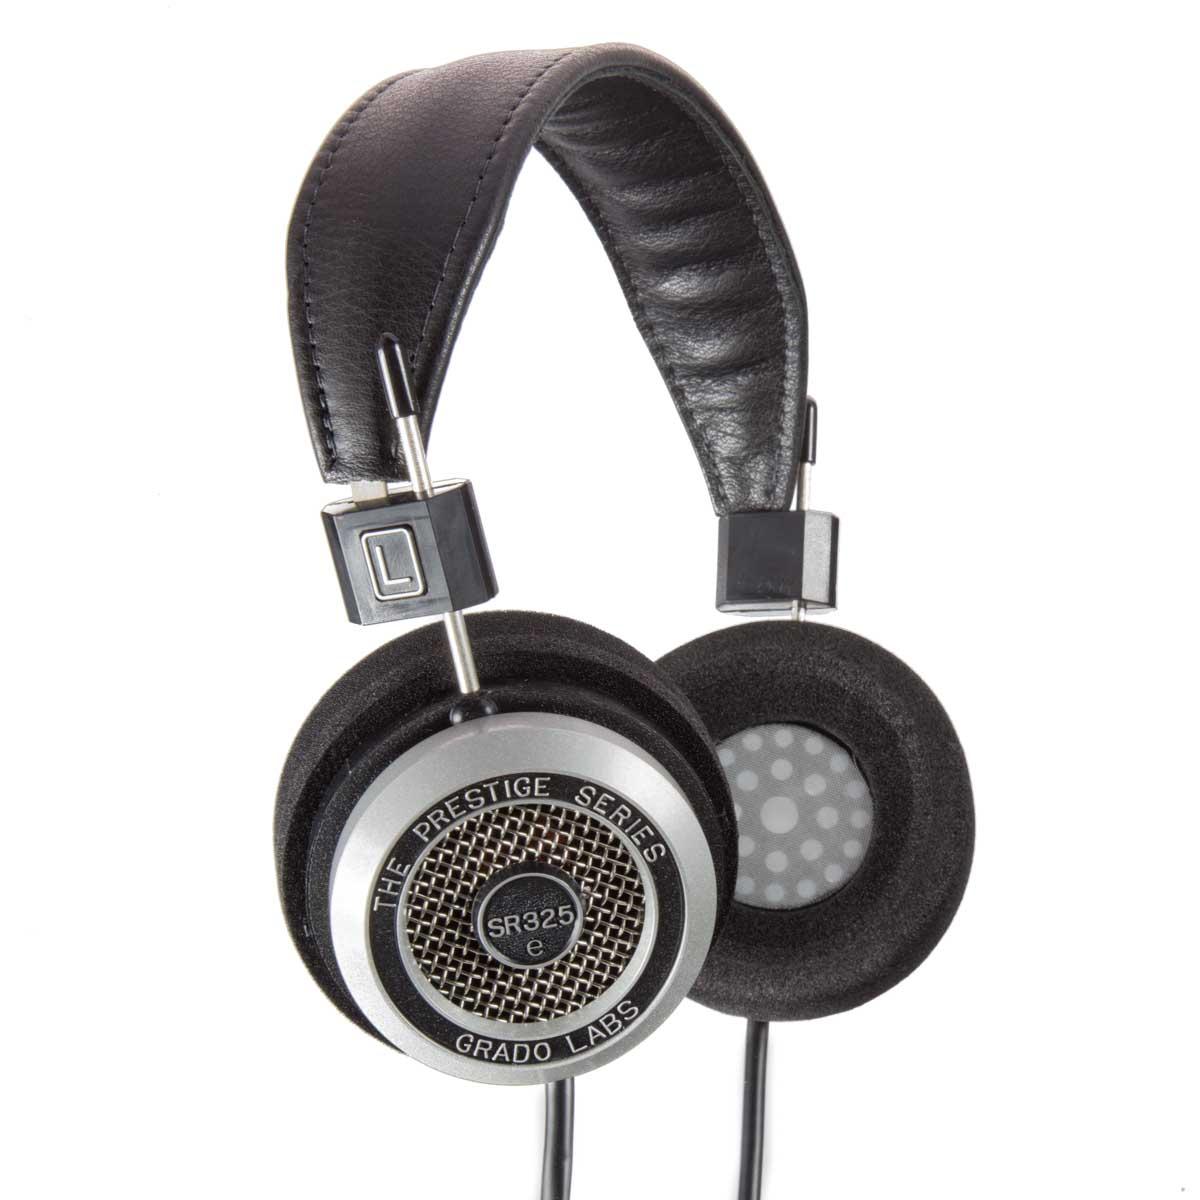 Brinkman Audio Washington DC Virginia authorized dealer